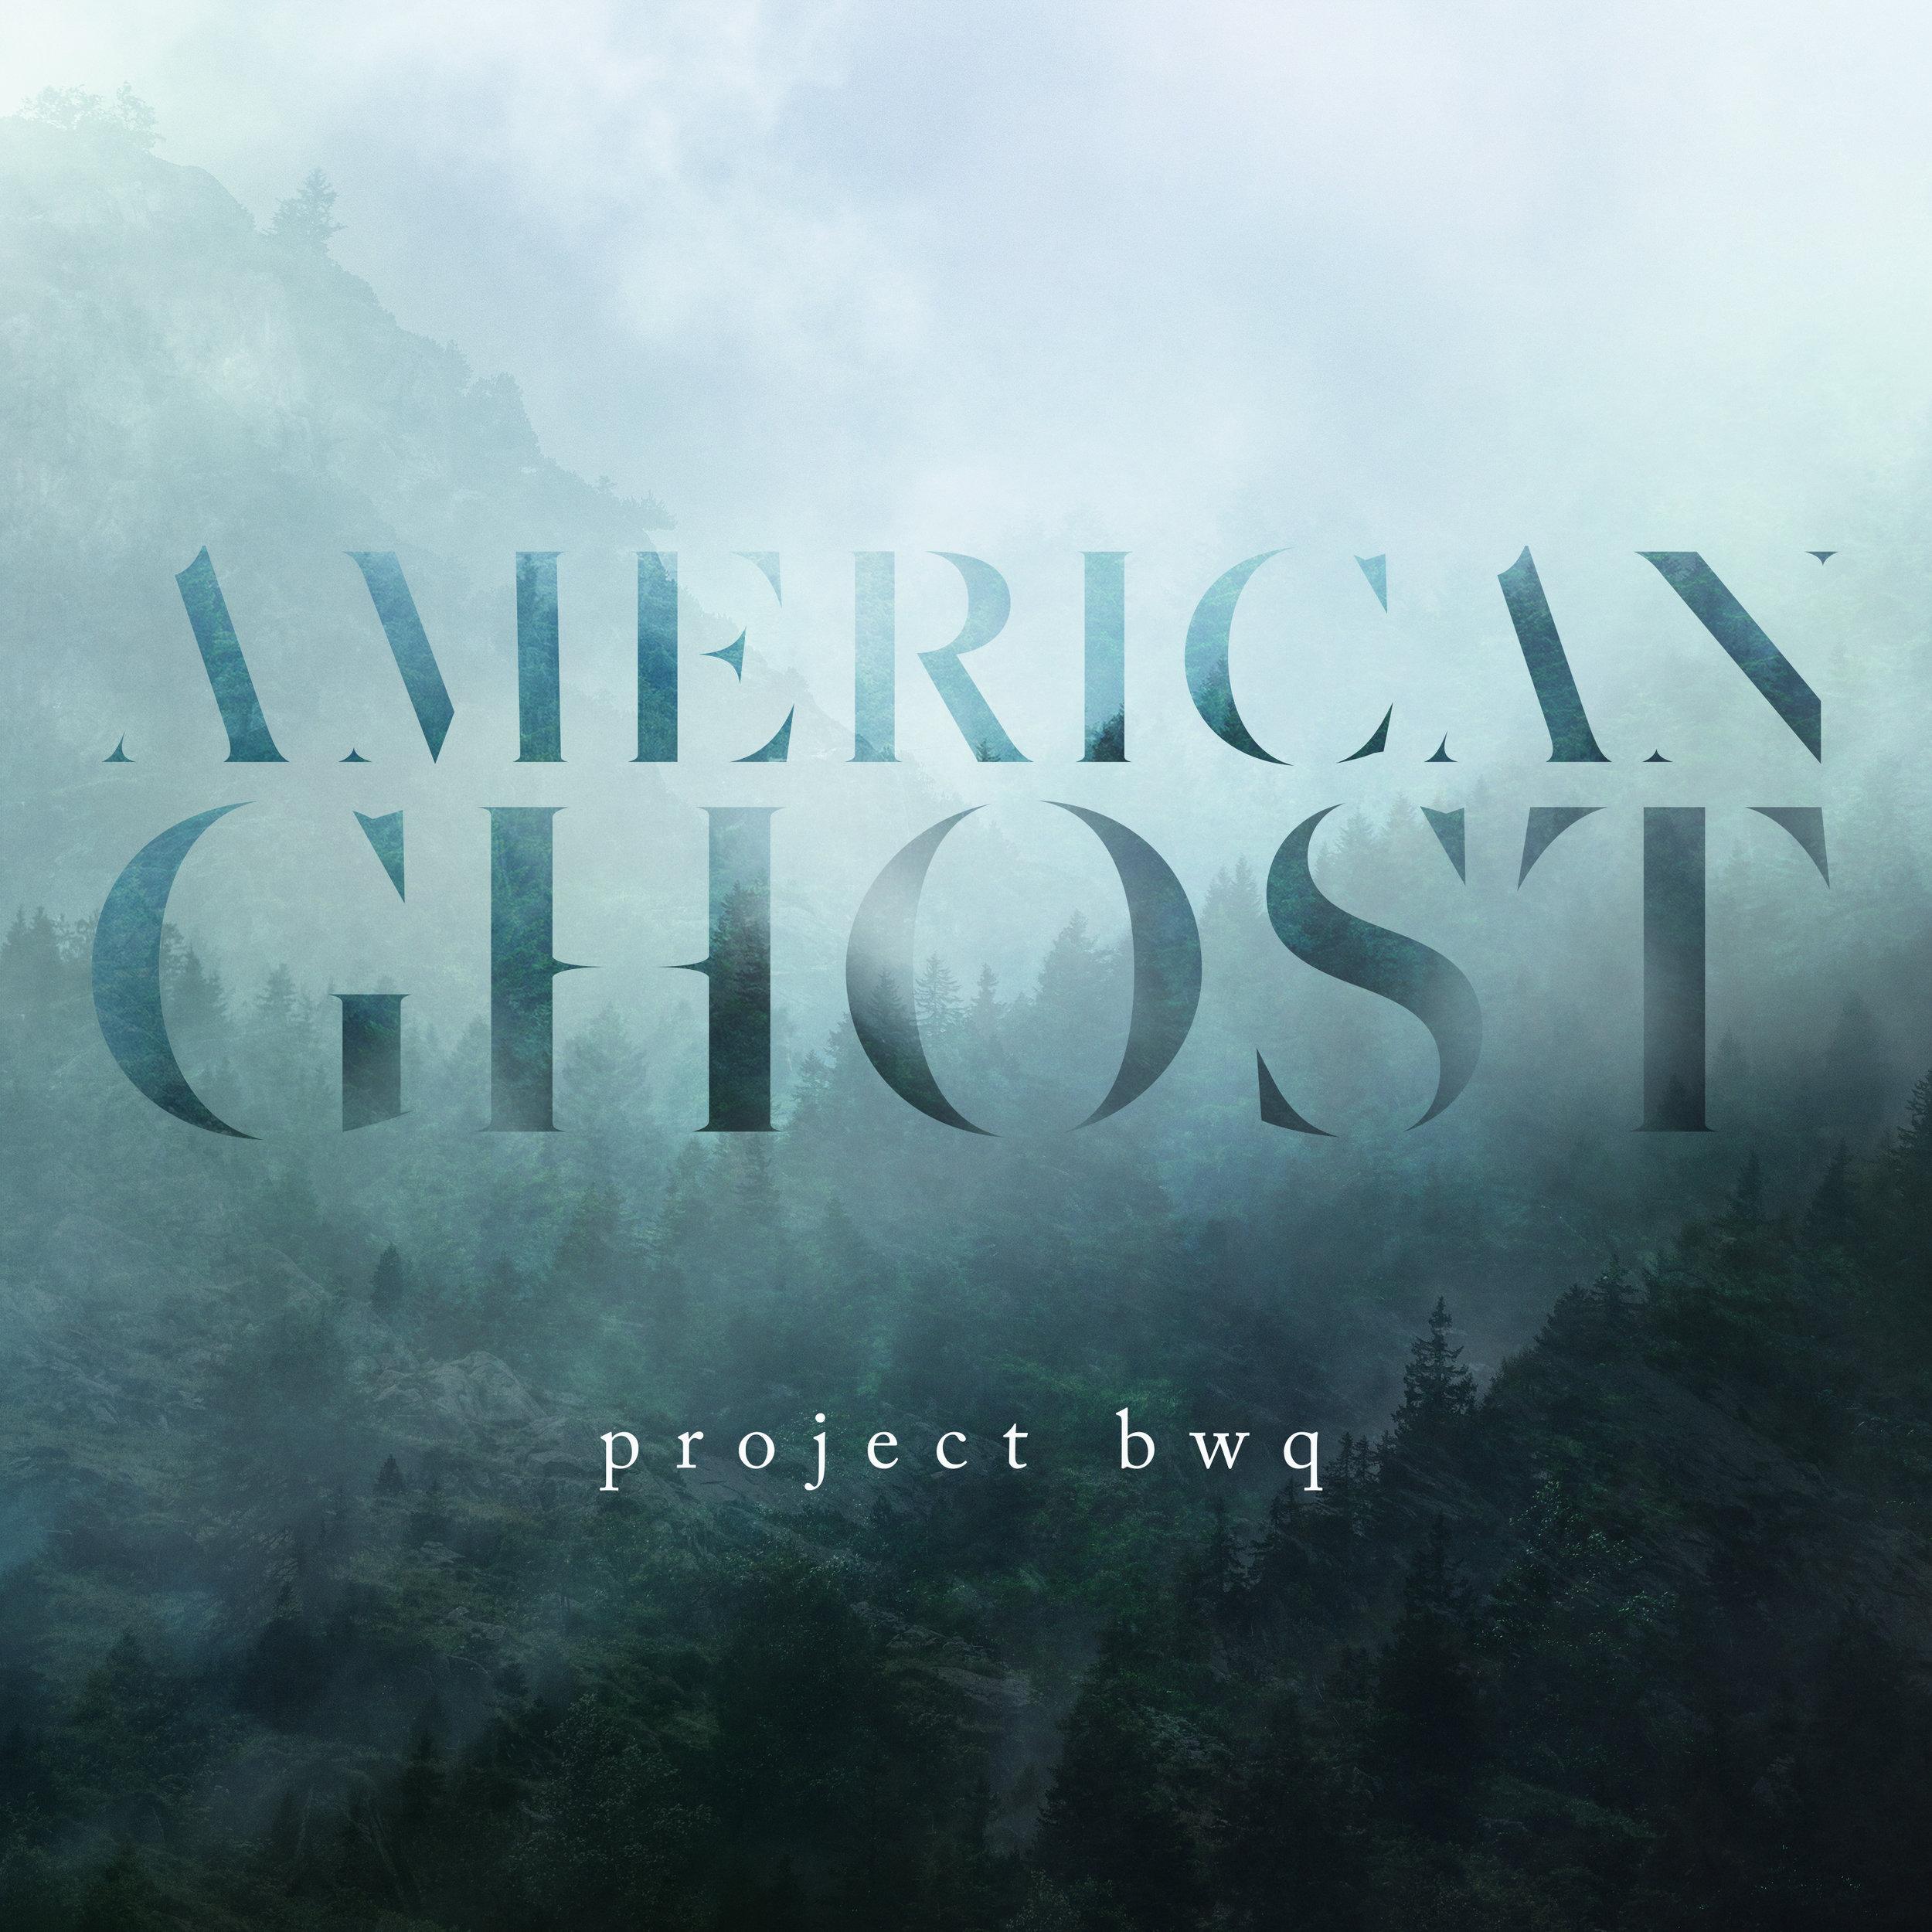 ProjectBWQ_AmericanGhost-DistroKid.jpg